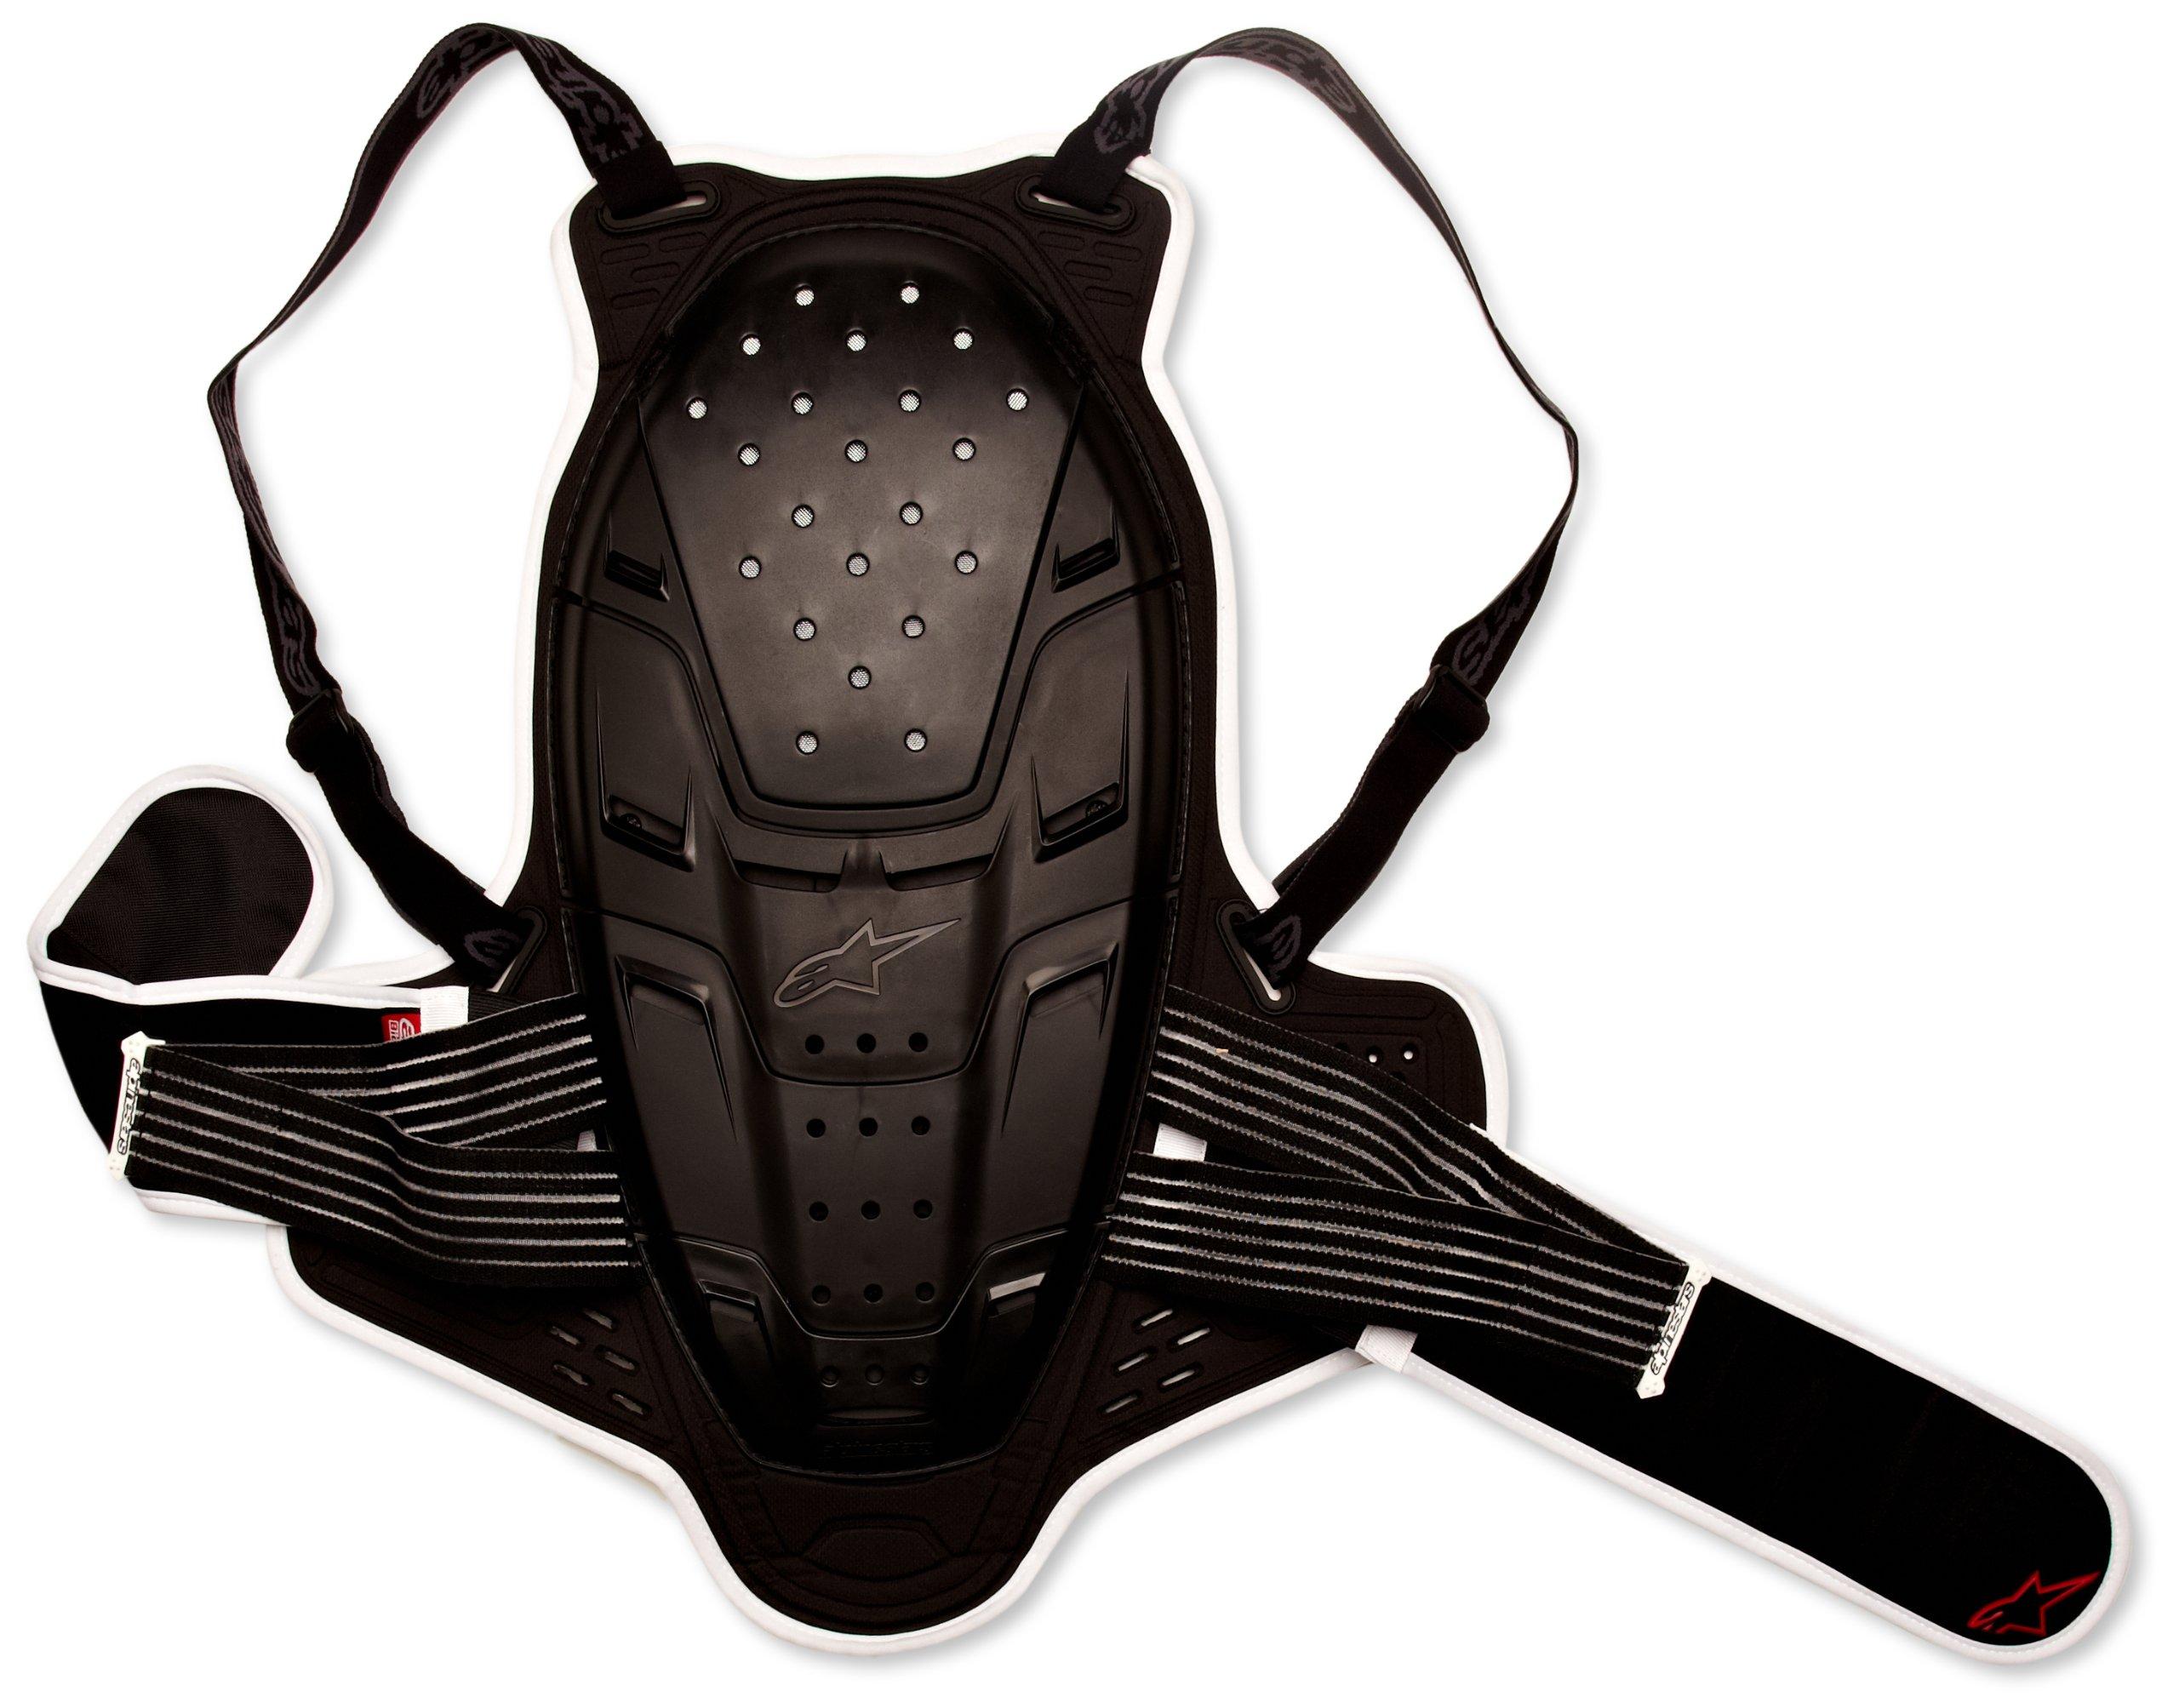 Alpinestars MTB Bionic Back Protector for BNS, X-Large, Black